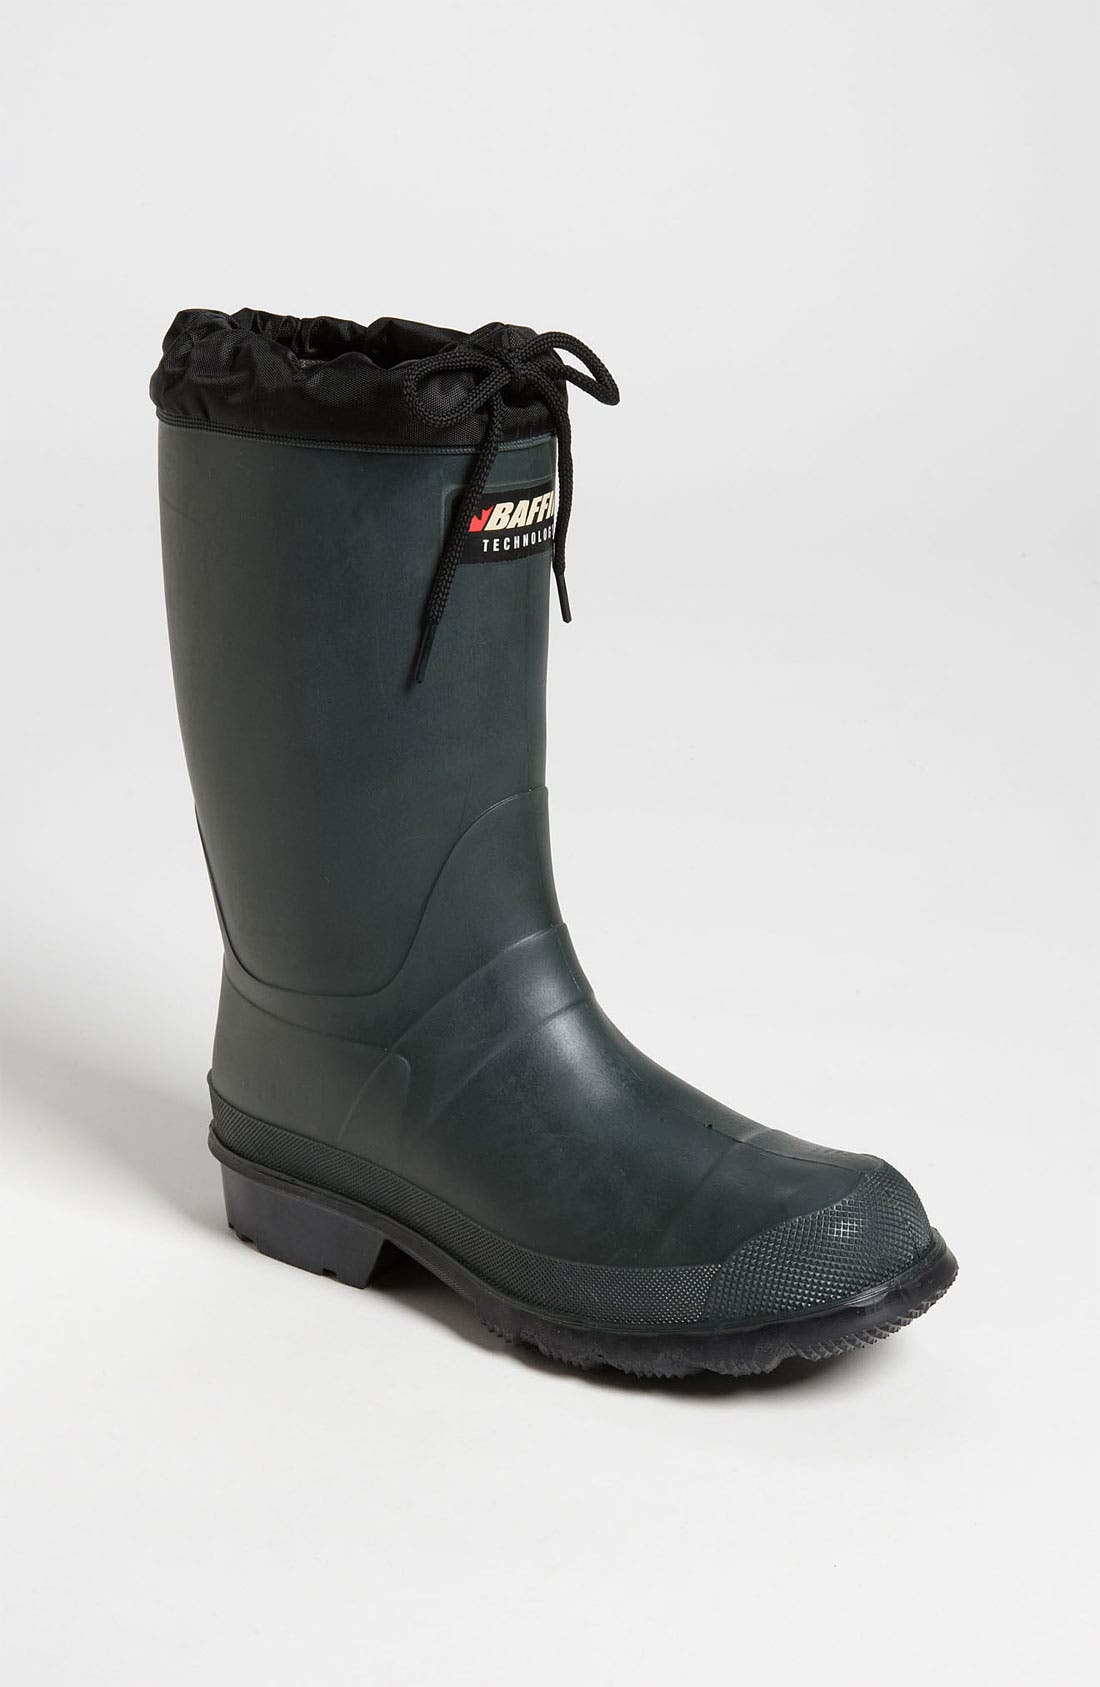 Alternate Image 1 Selected - Baffin 'Hunter' Snow Boot